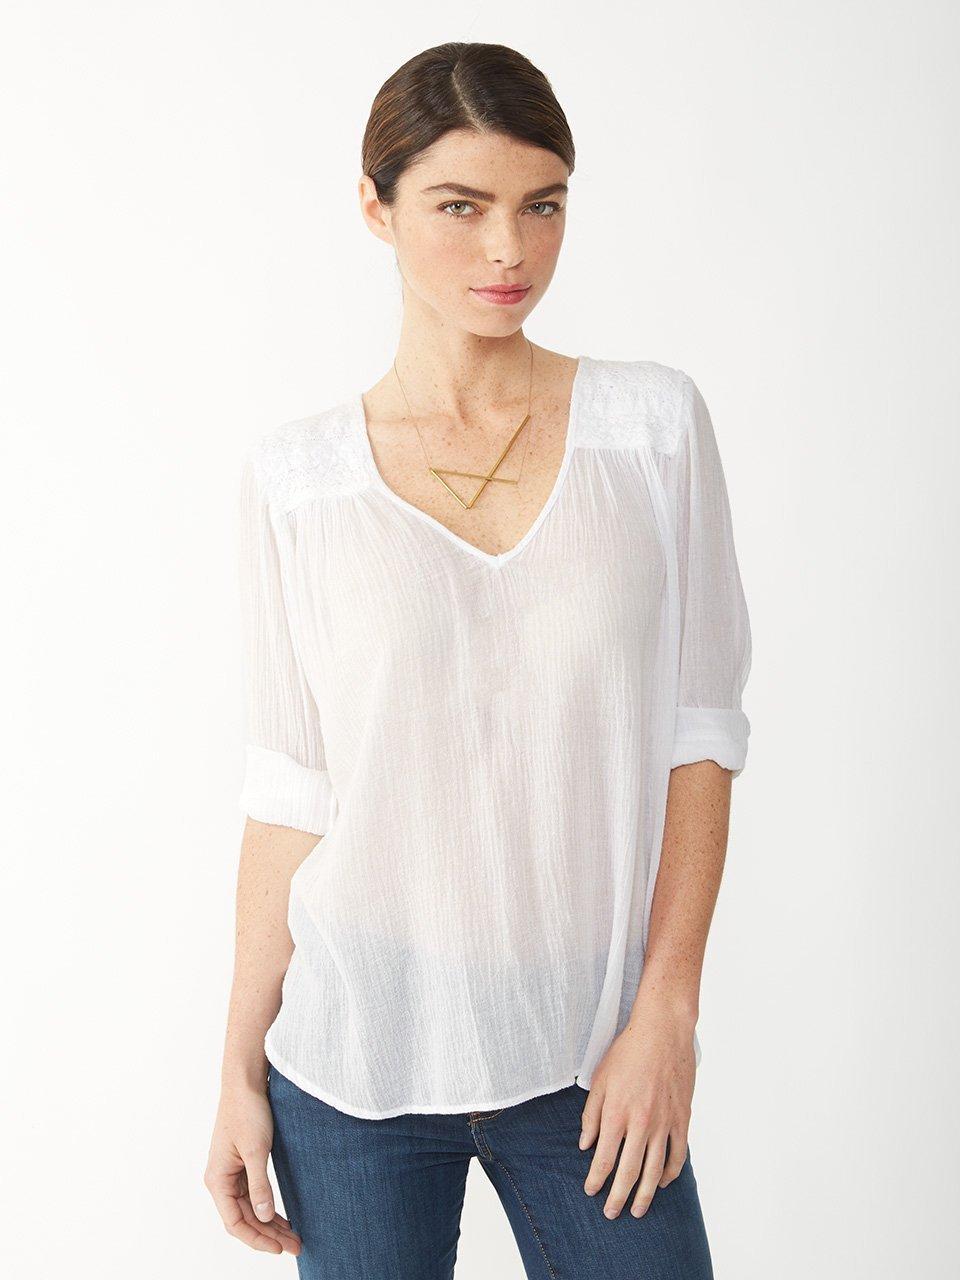 70s Shirts For Women